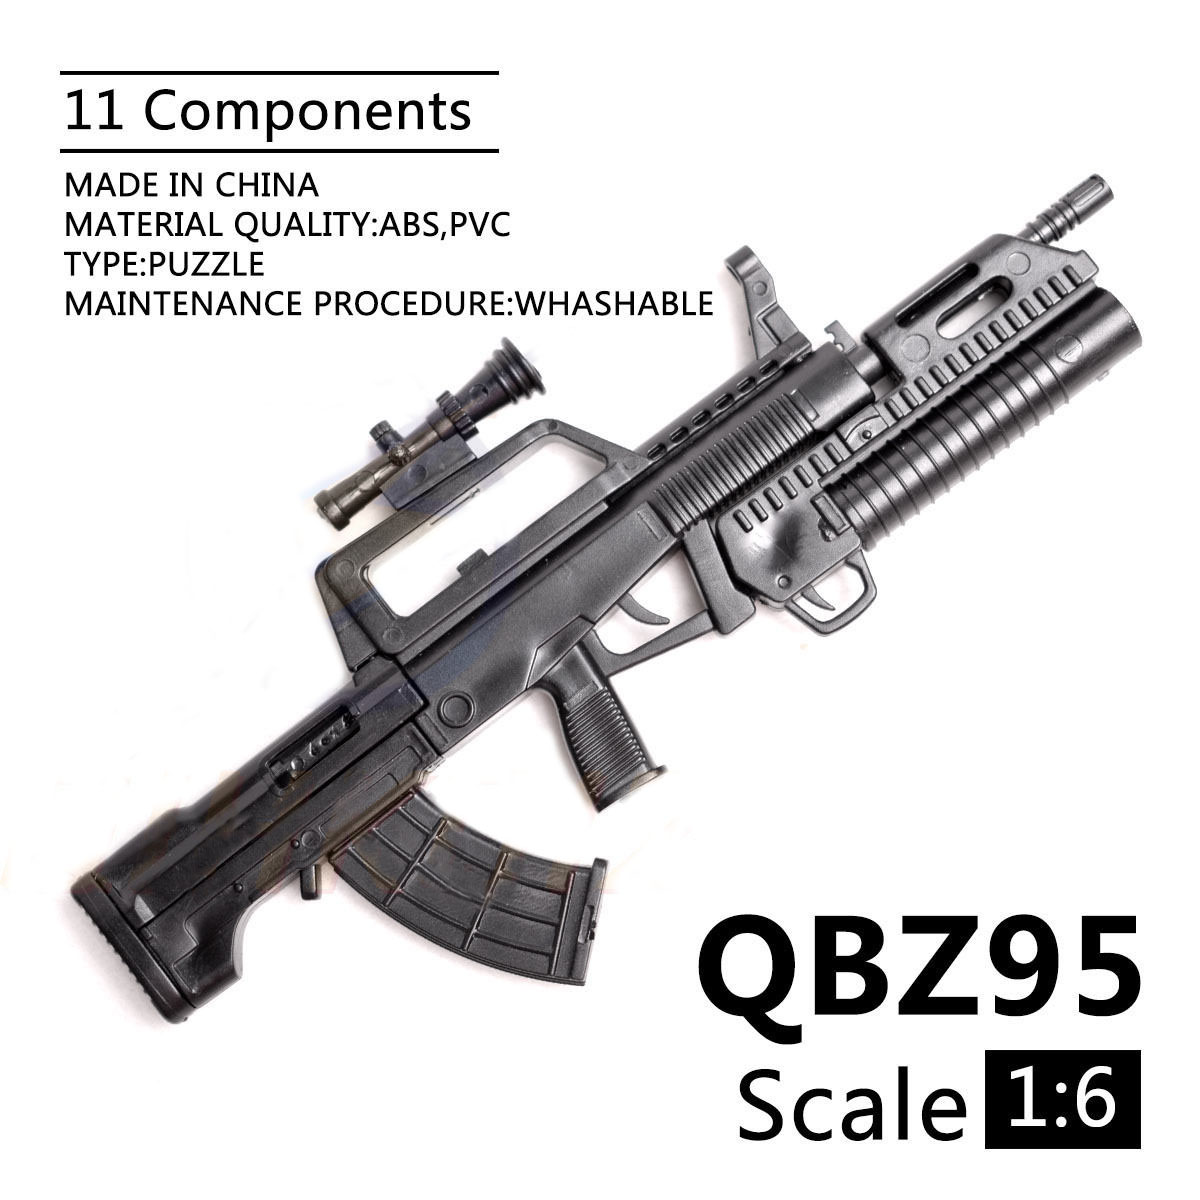 1/6 Scale PUBG Mobile QBZ-95 Rifle Toy Gun Model Assembly Puzzles Building Bricks Gun For Action Figures